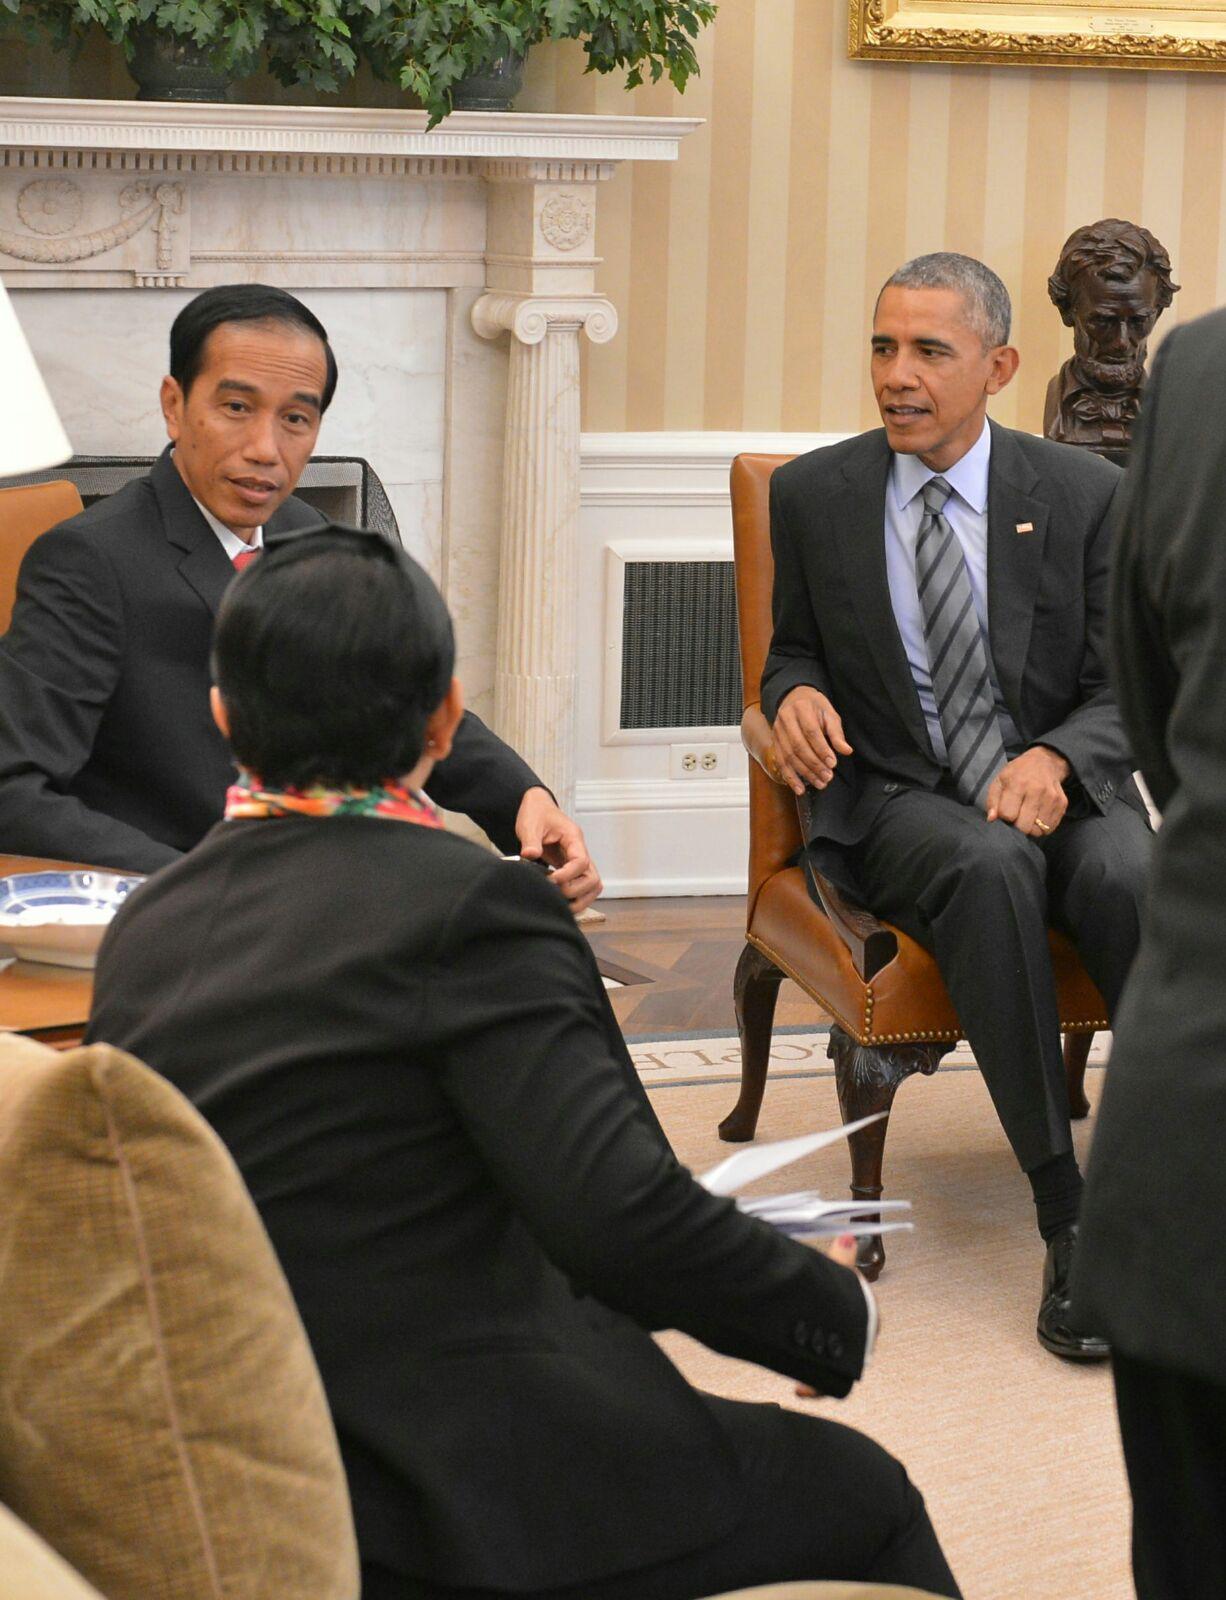 Jokowi Obama4